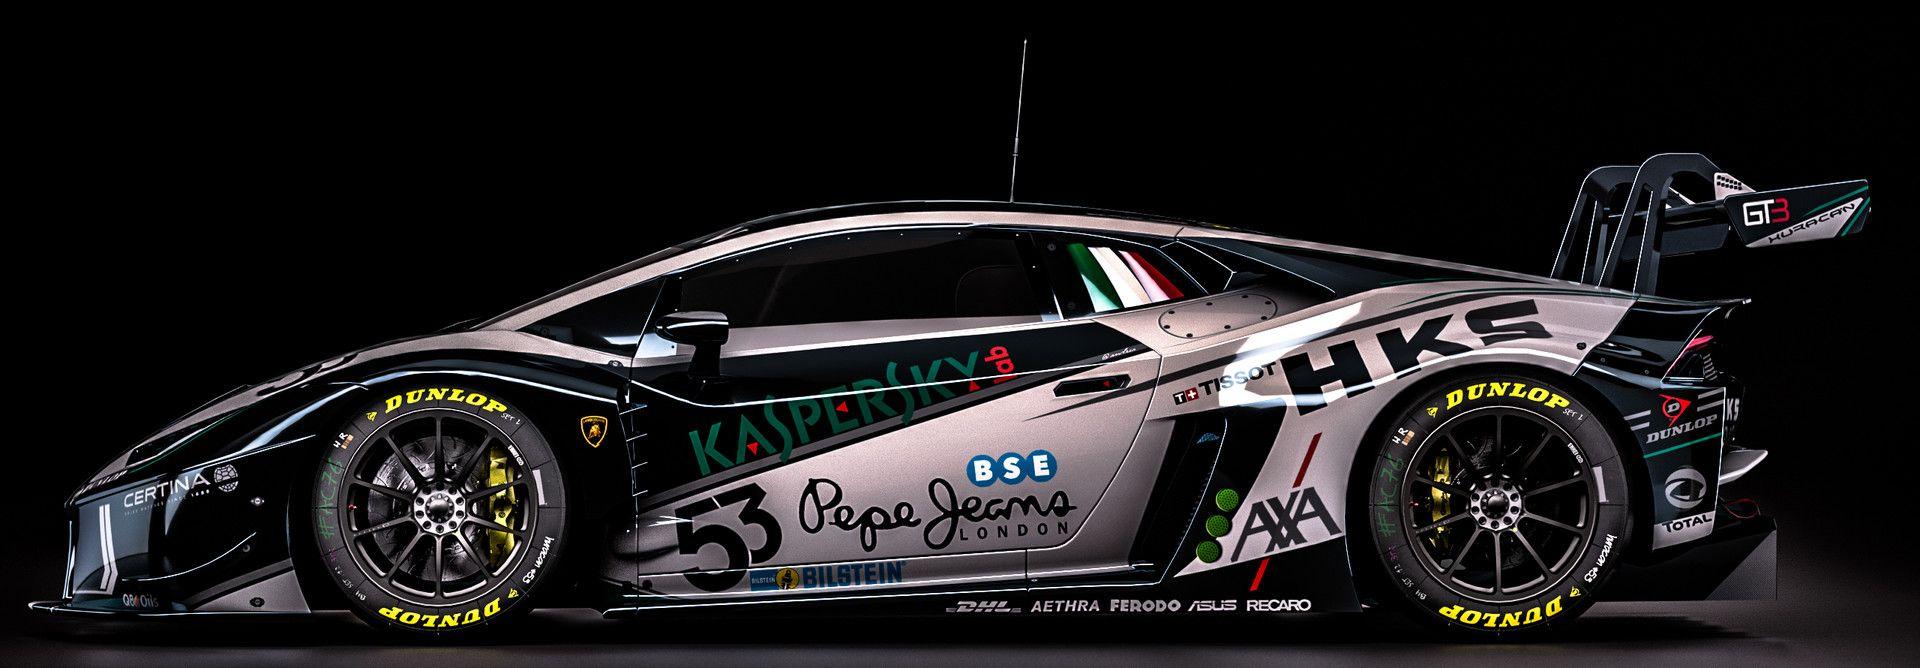 Lamborghini Huracan Fantasy Kaspersky Livery By Nancorocks